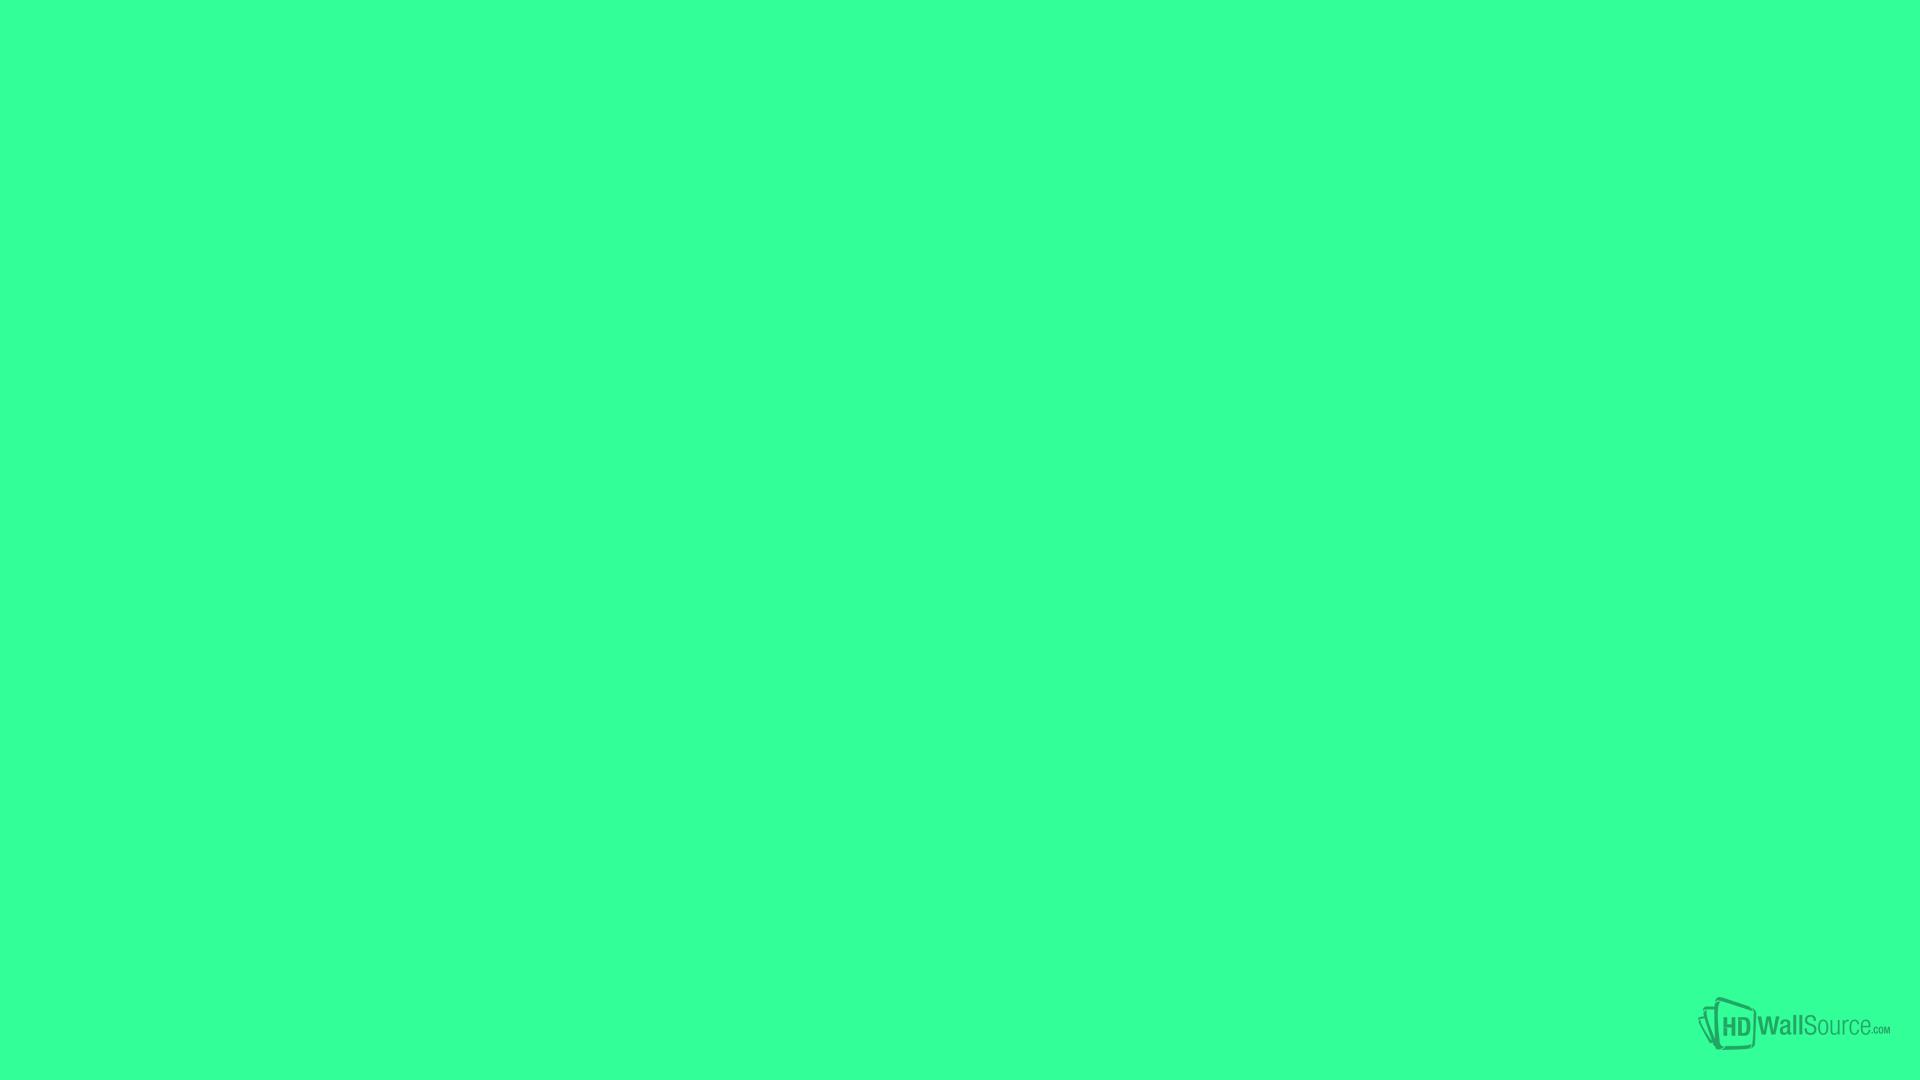 33ff99 wallpaper 71104